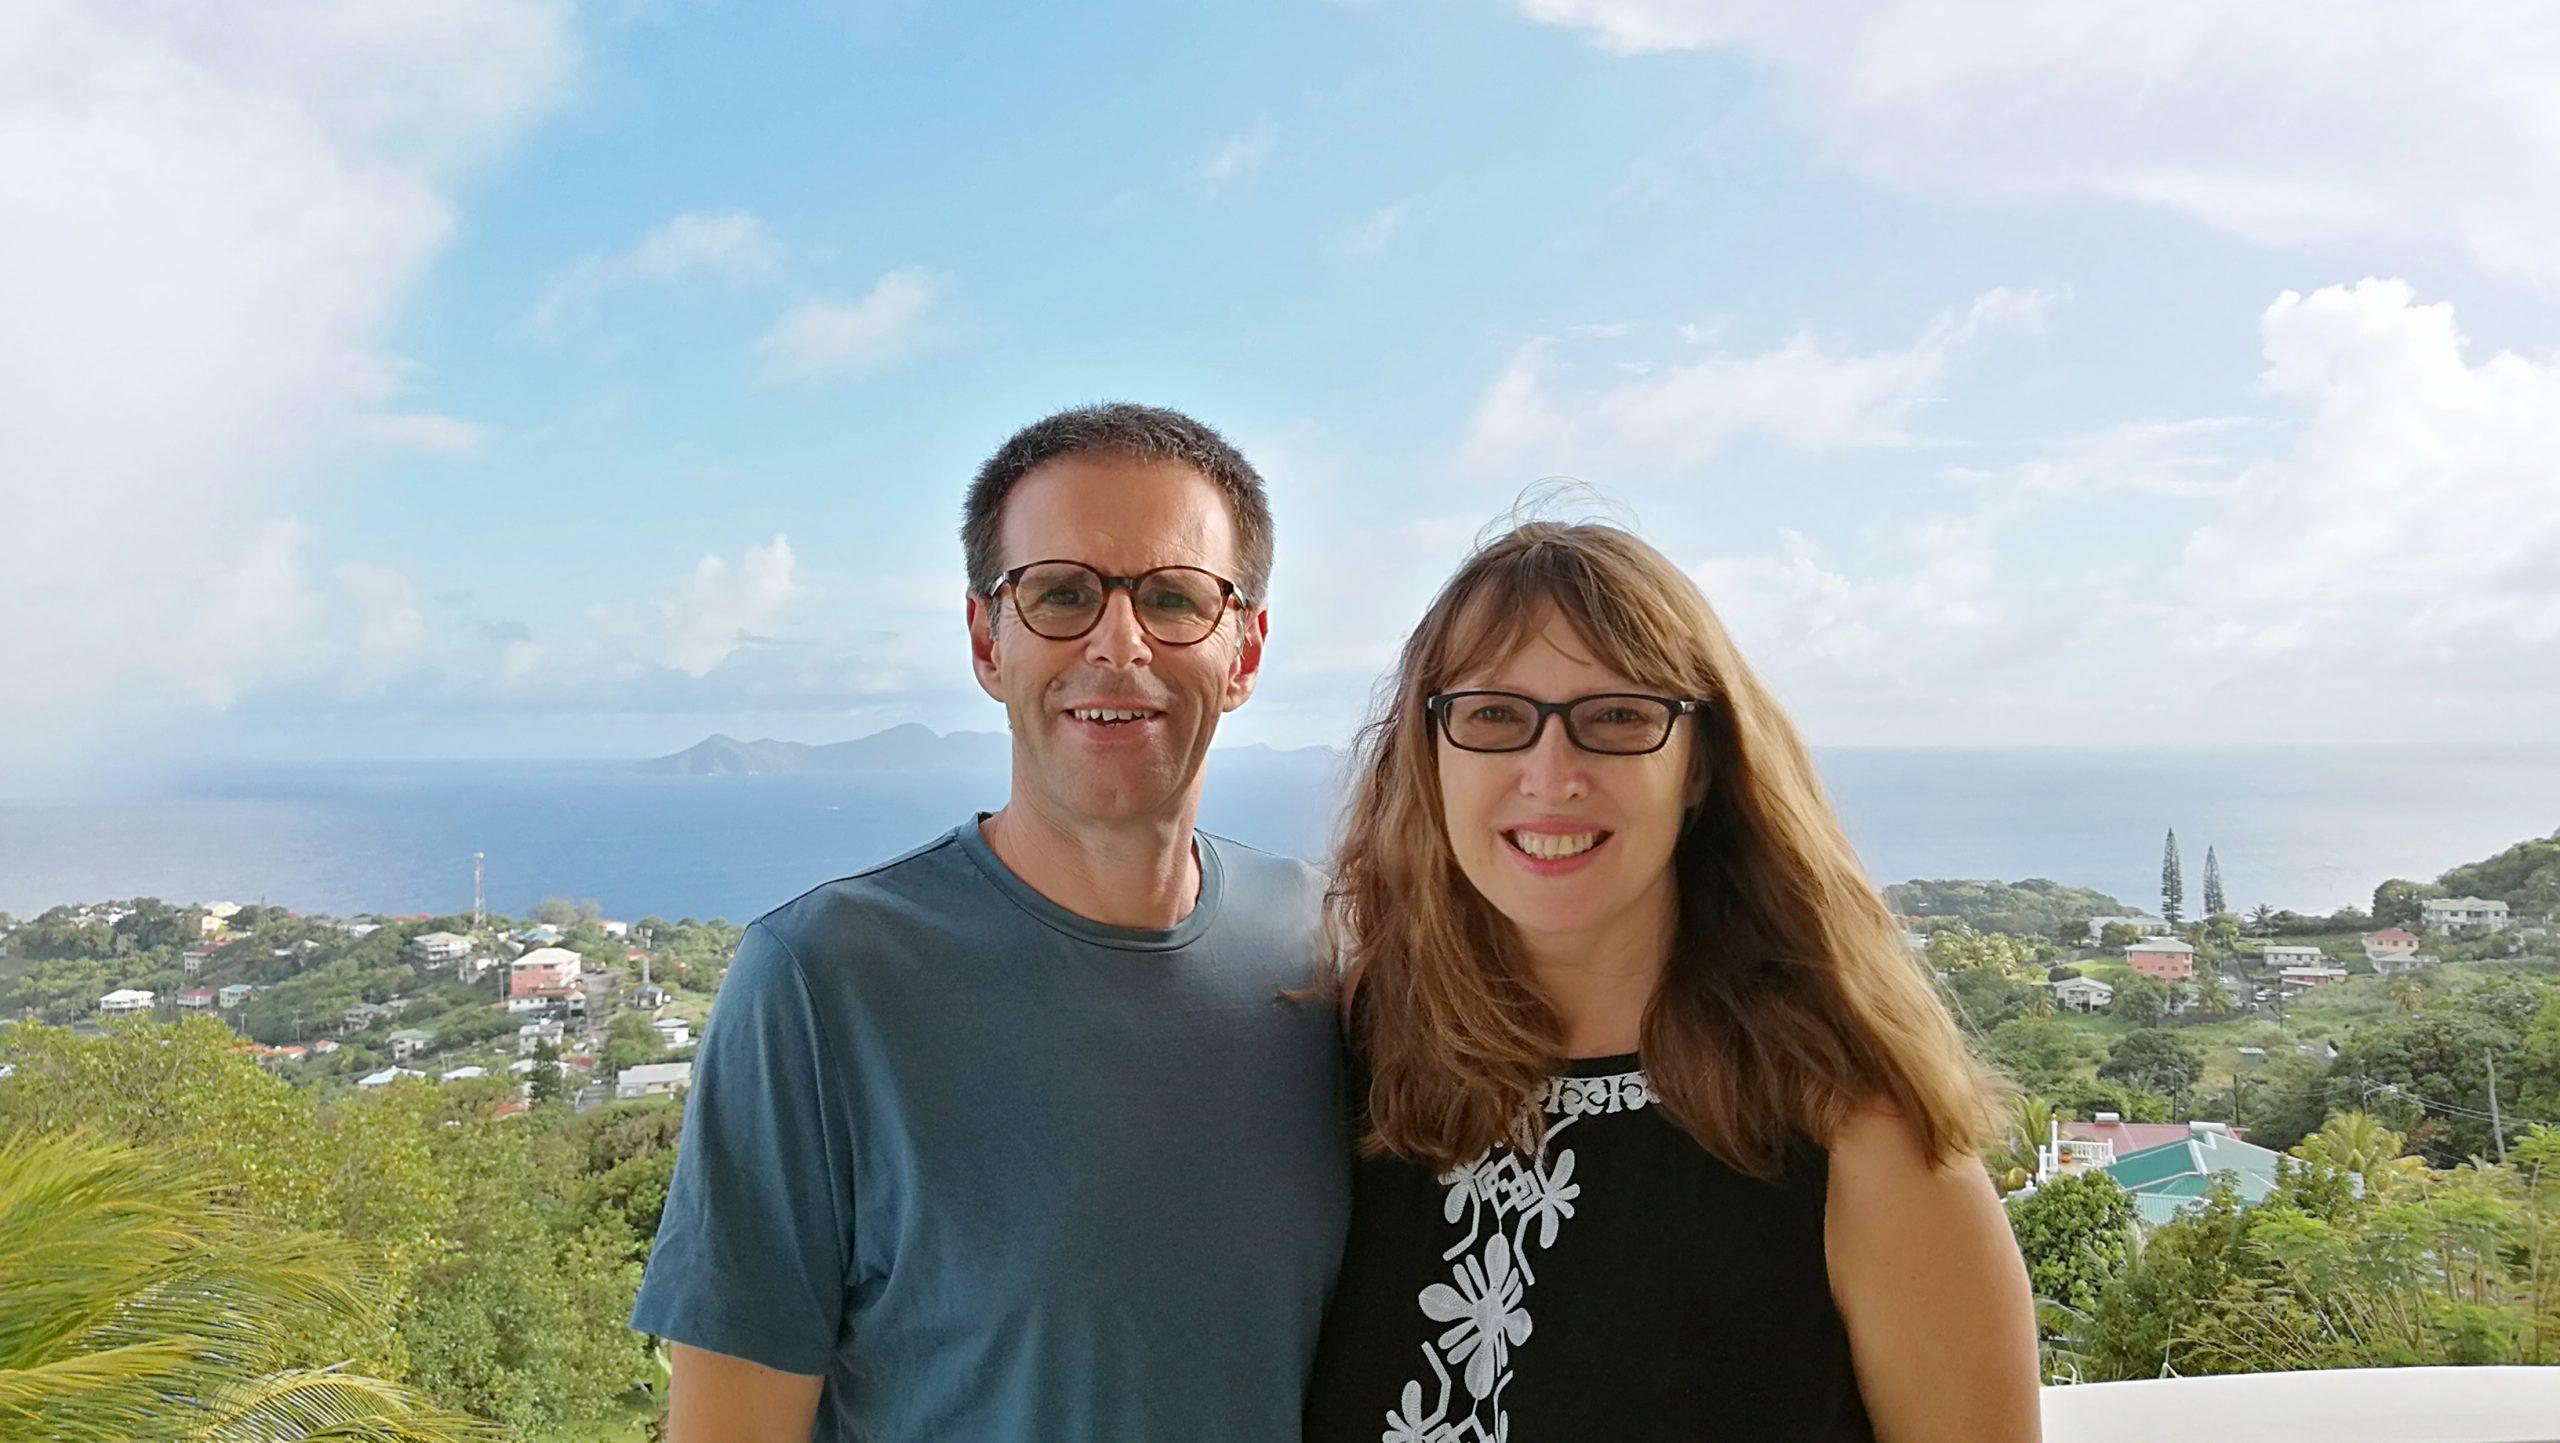 Vanessa Anderson and Ian Usher